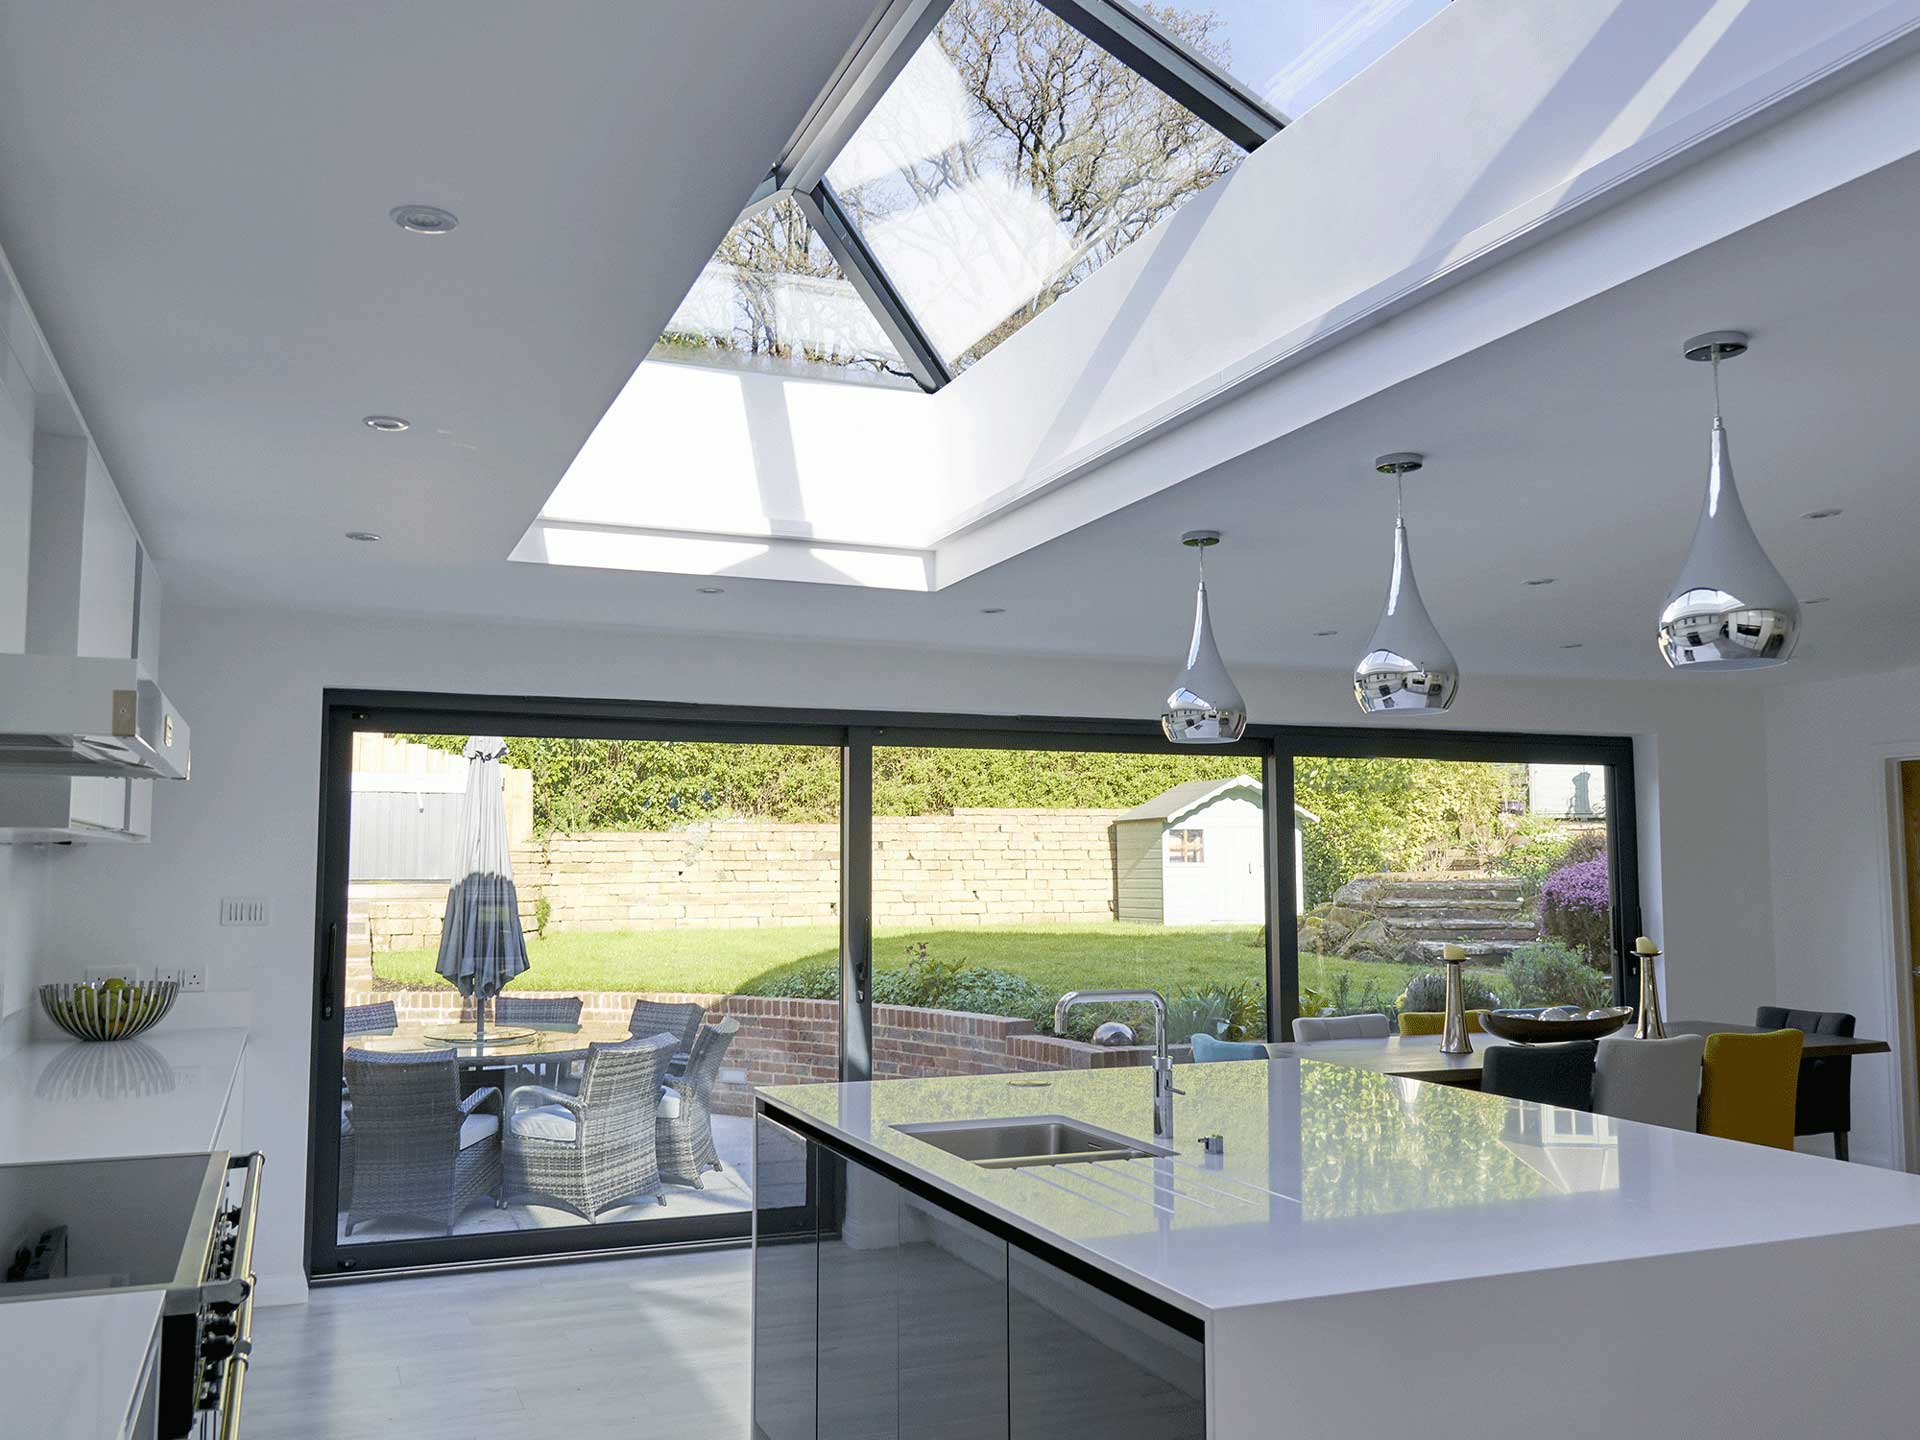 uPVC replacement windows Market Weighton